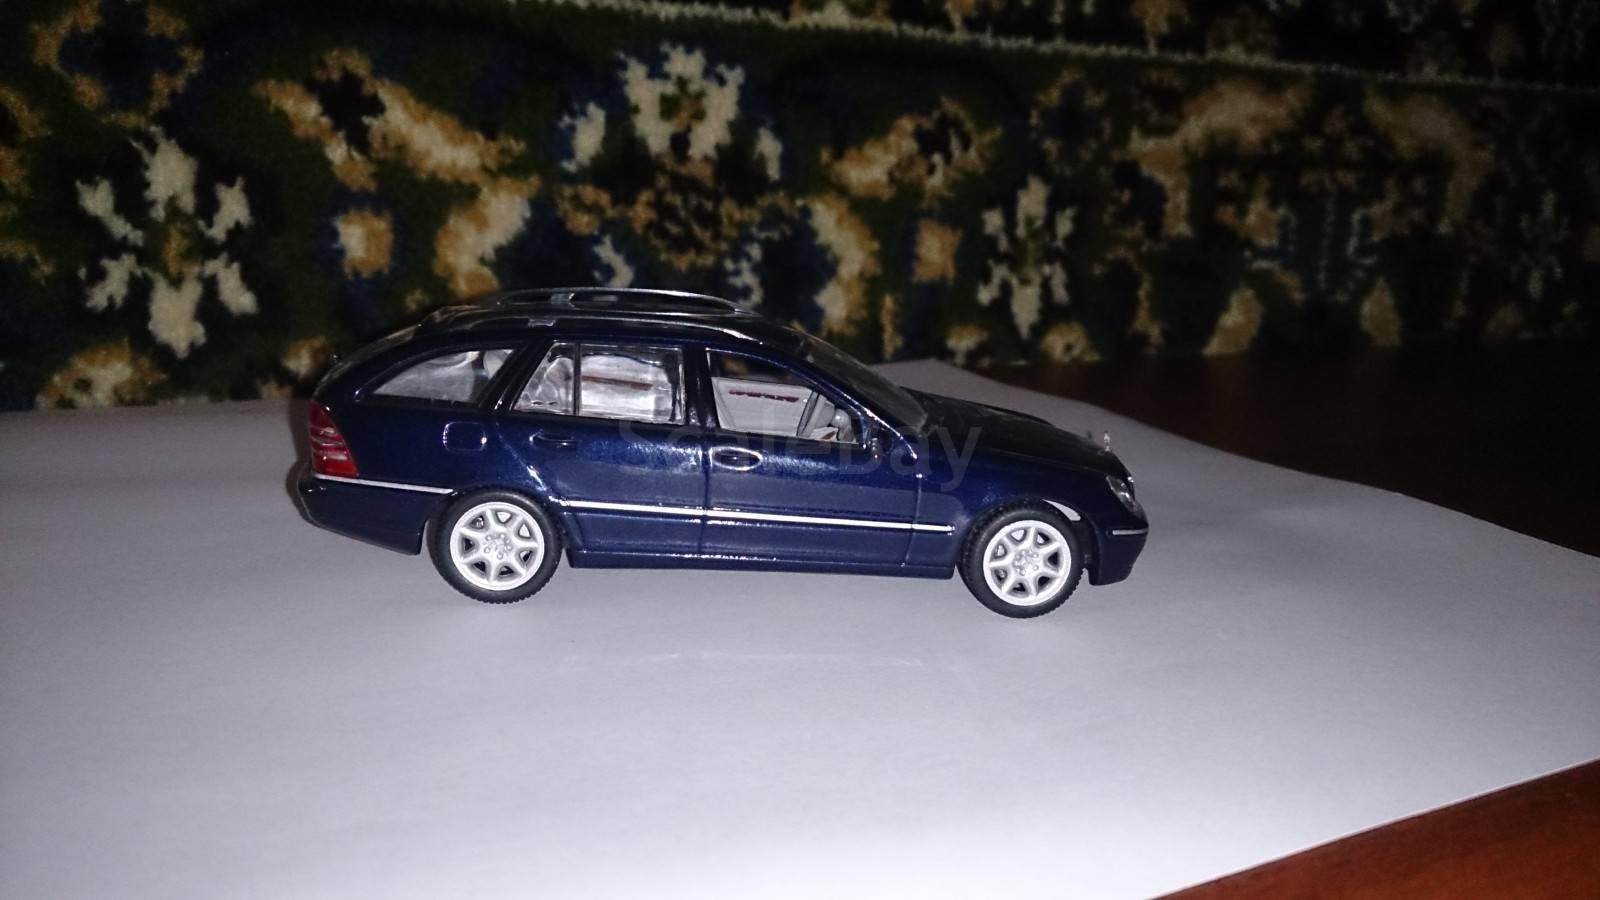 Mercedes benz c class t model s203 for Mercedes benz c class t model